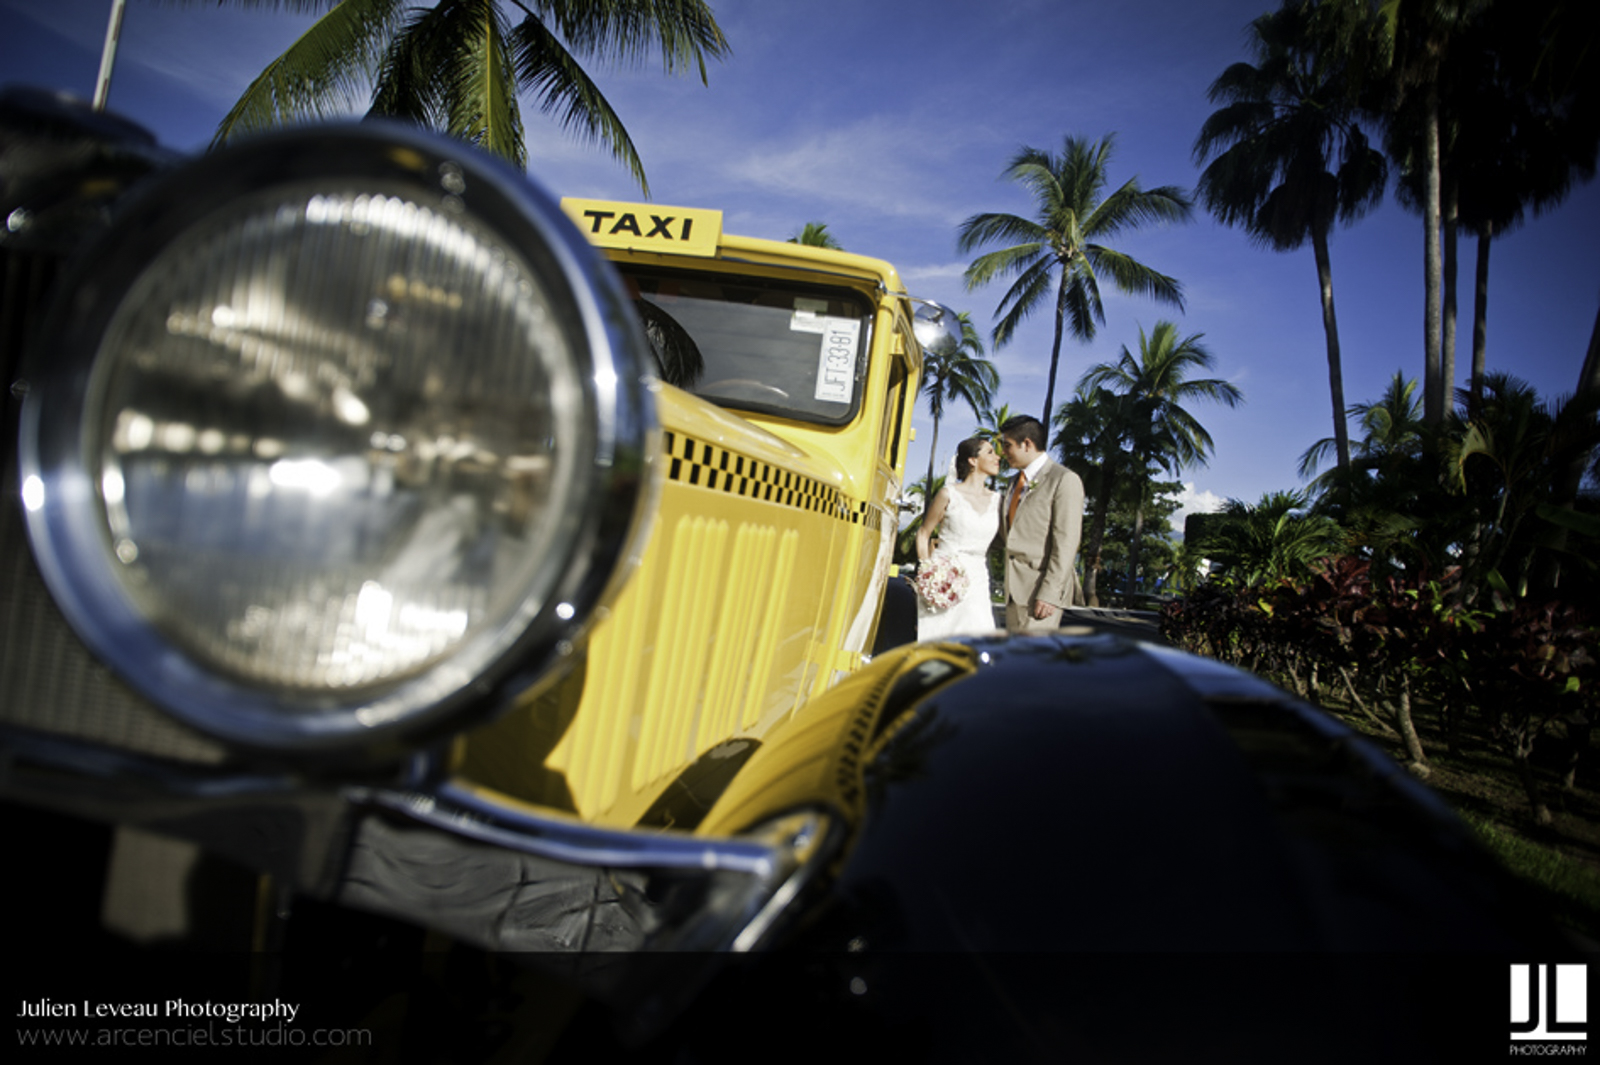 Wedding Photographer Puerto Vallarta - Professional photography